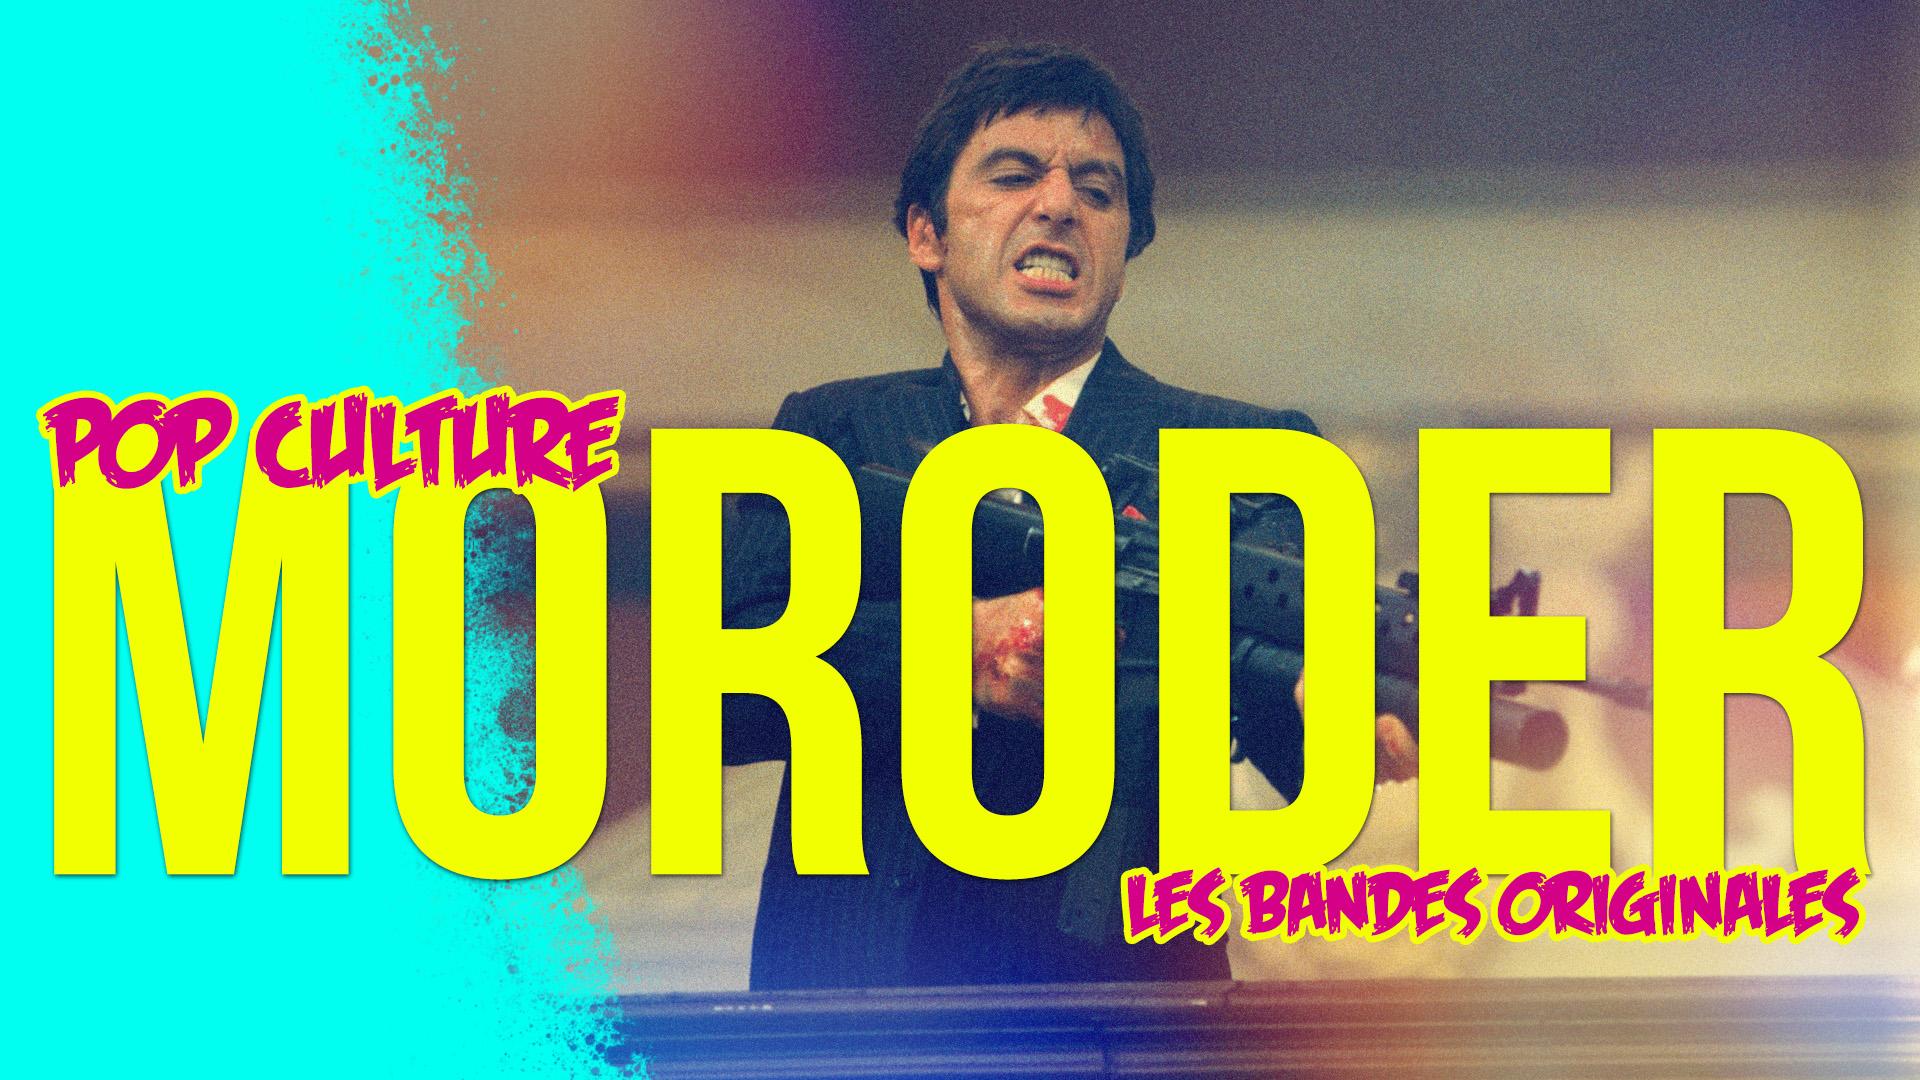 Giorgio Moroder - Les bandes originales